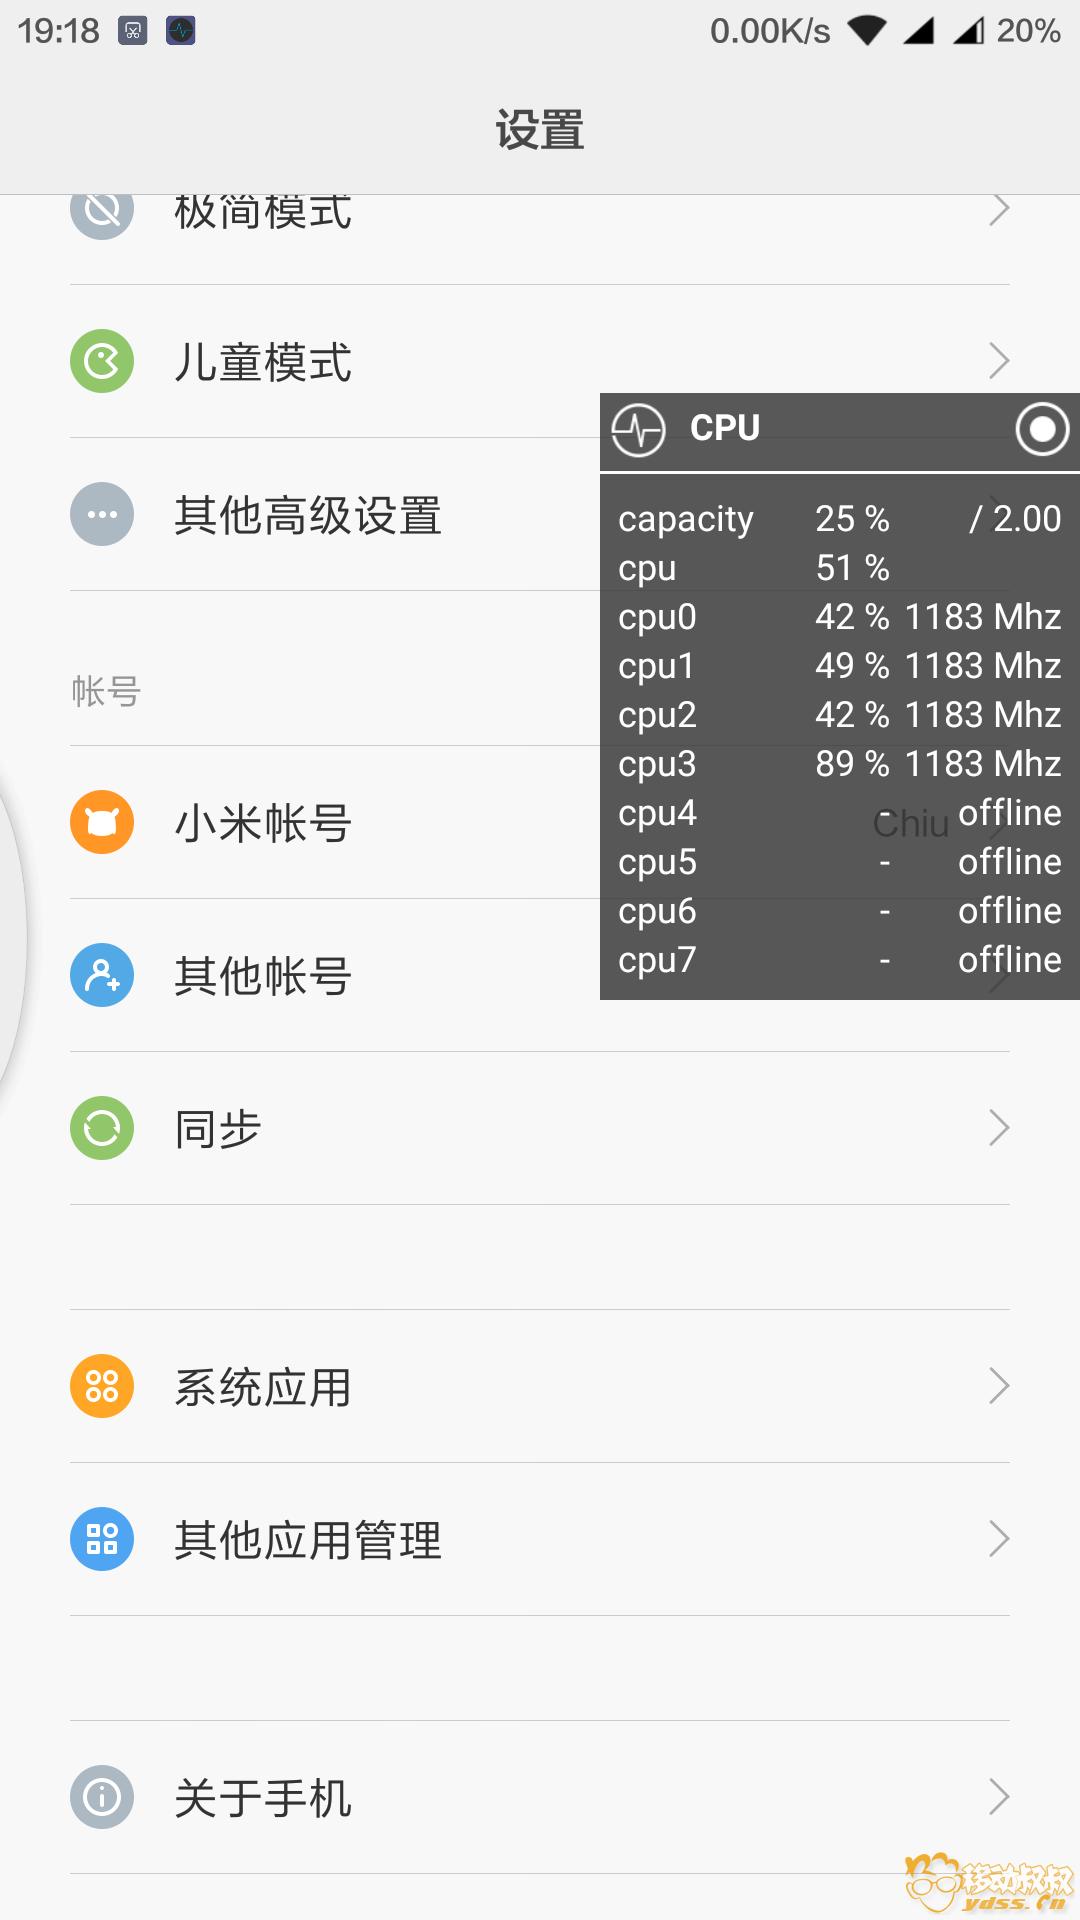 Screenshot_2016-03-19-19-18-29_com.android.settings.png